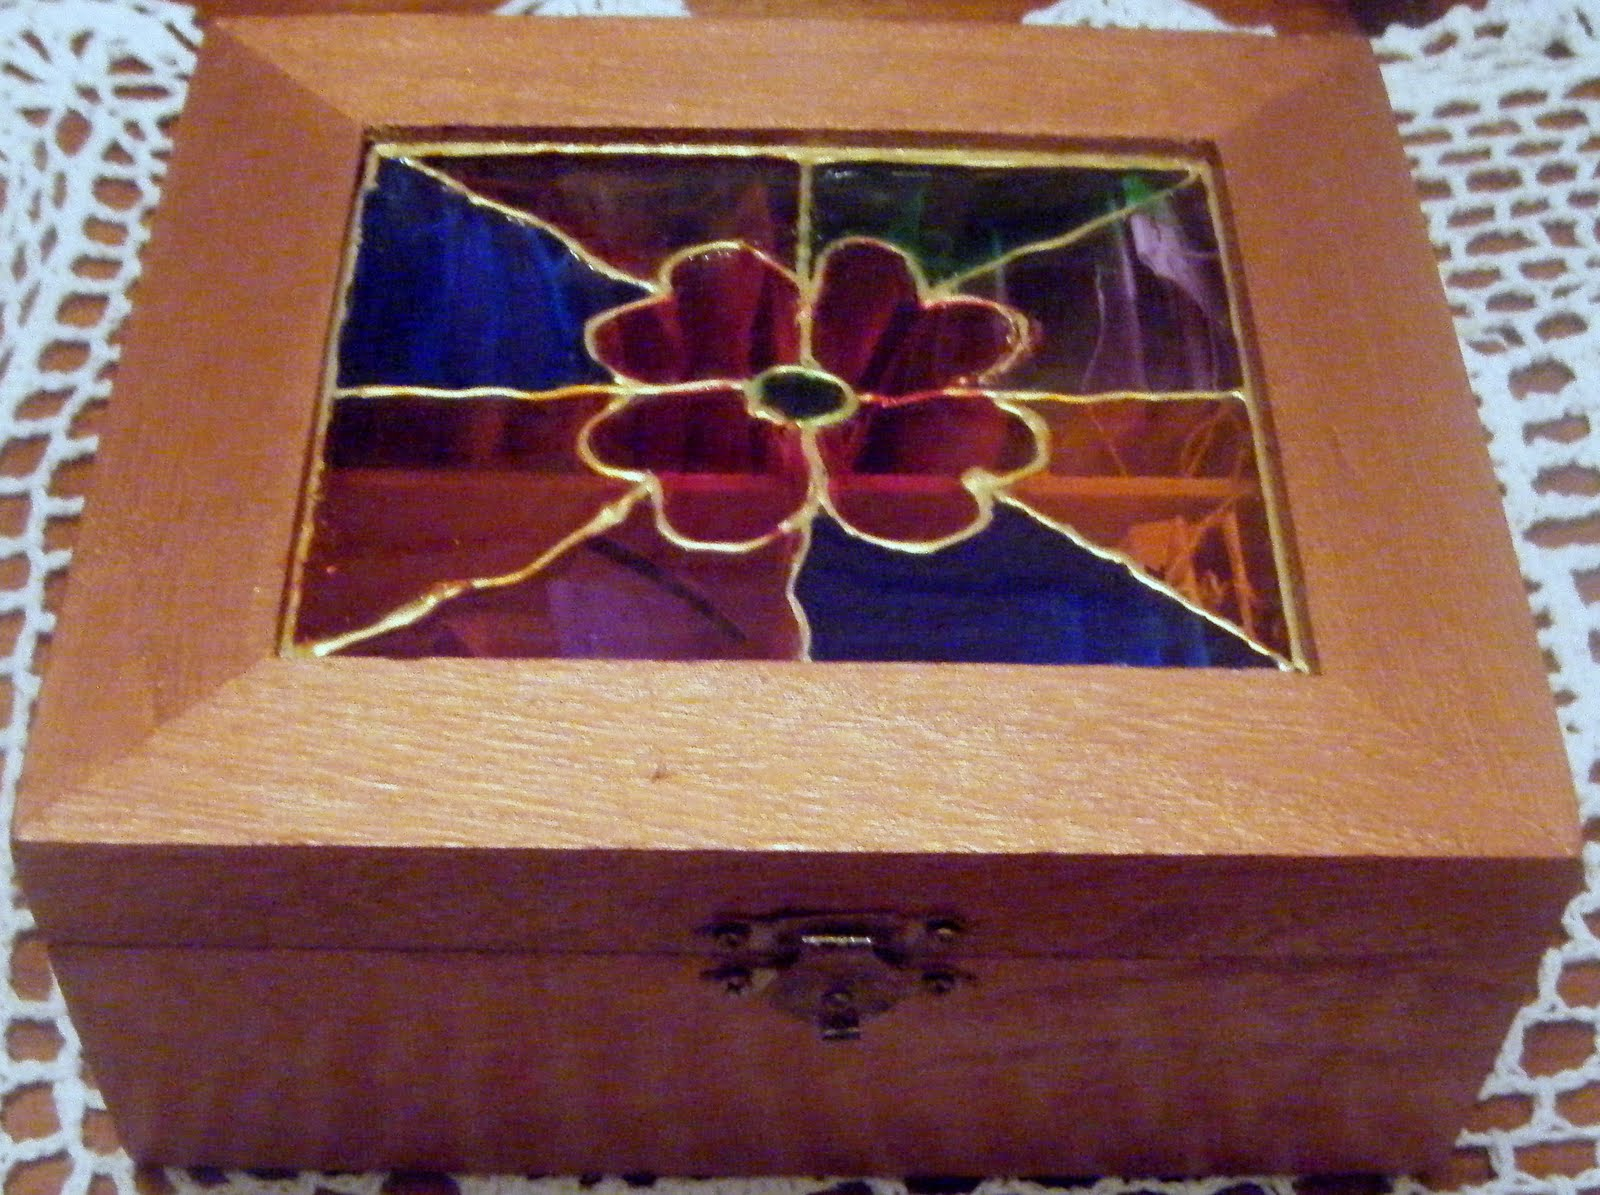 Manualidades de mari caja de madera para infusiones paso a paso - Manualidades con cajas de madera ...